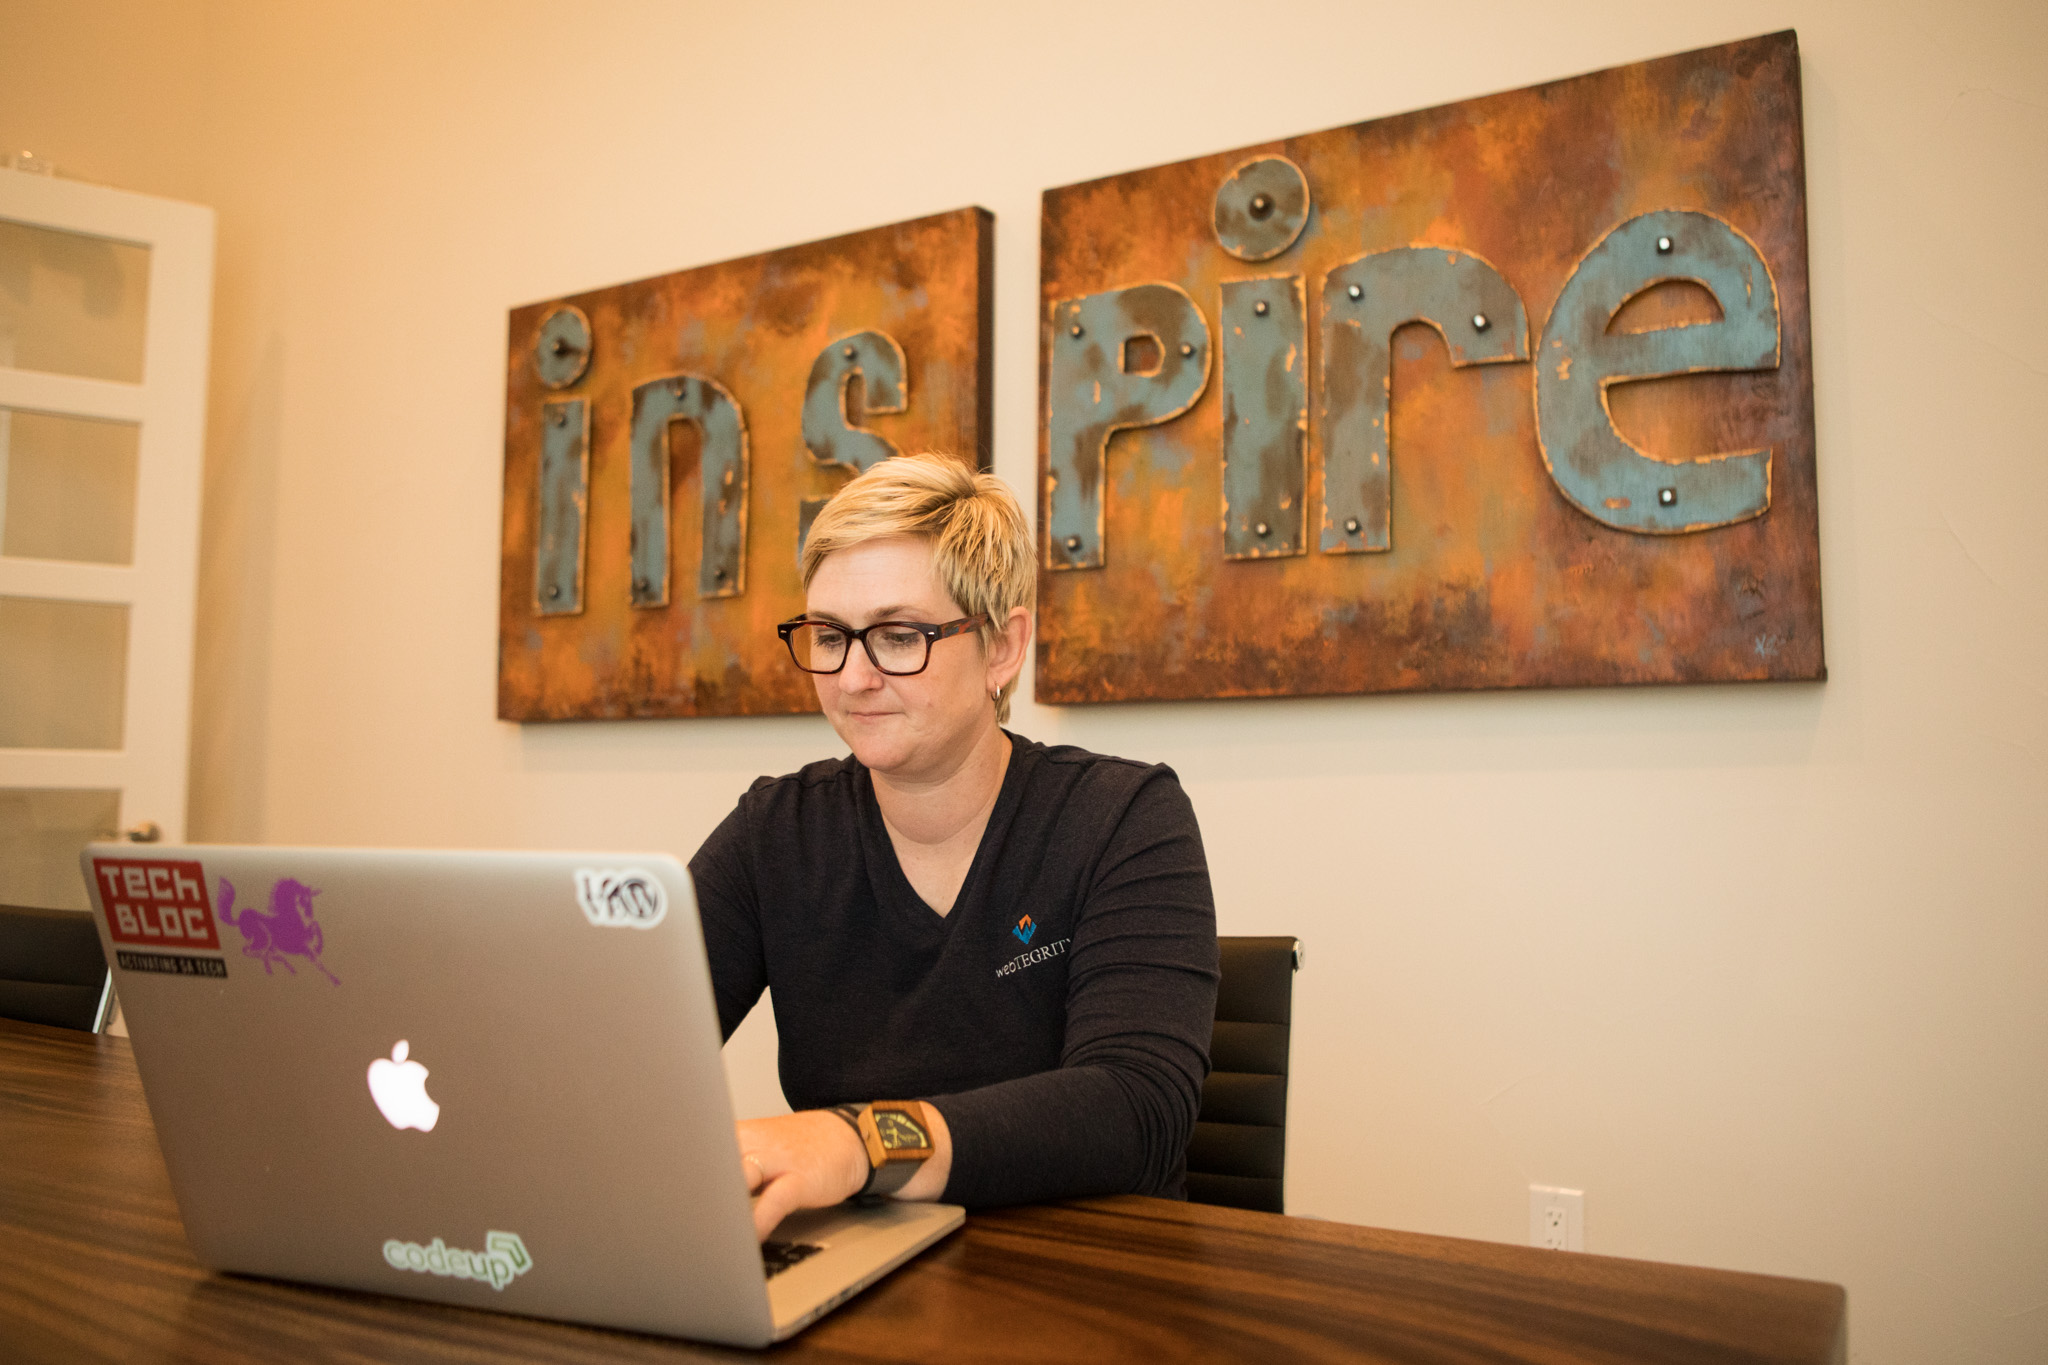 WebTegrity Co-Founder Kori Ashton works in the conference room of WebTegrity.